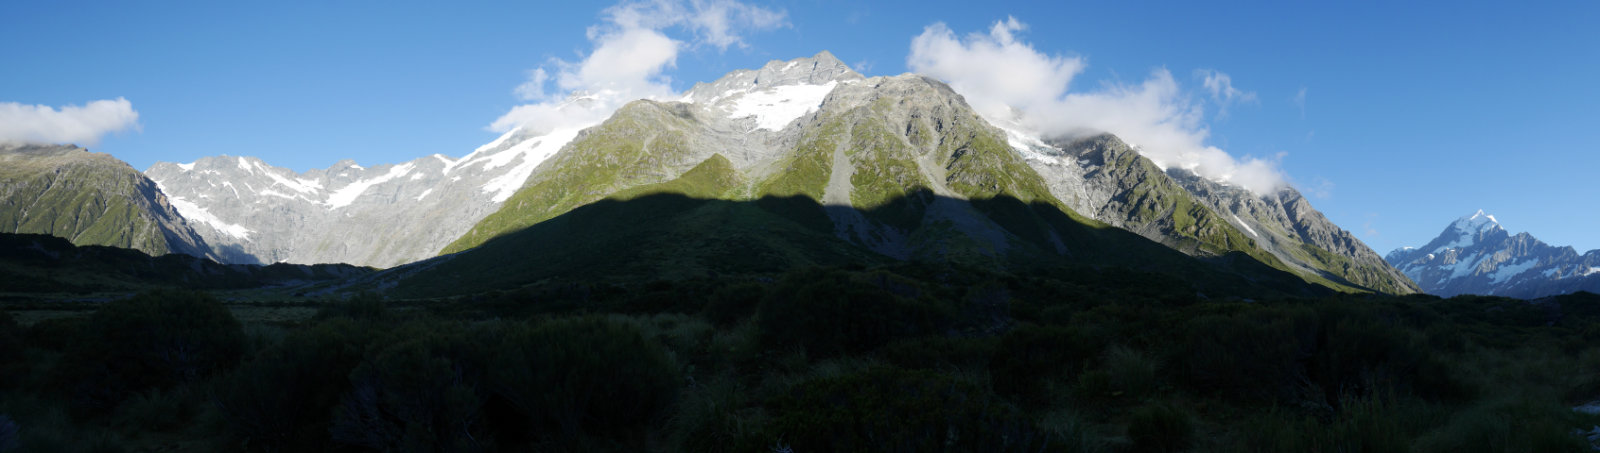 Mount Sefton View